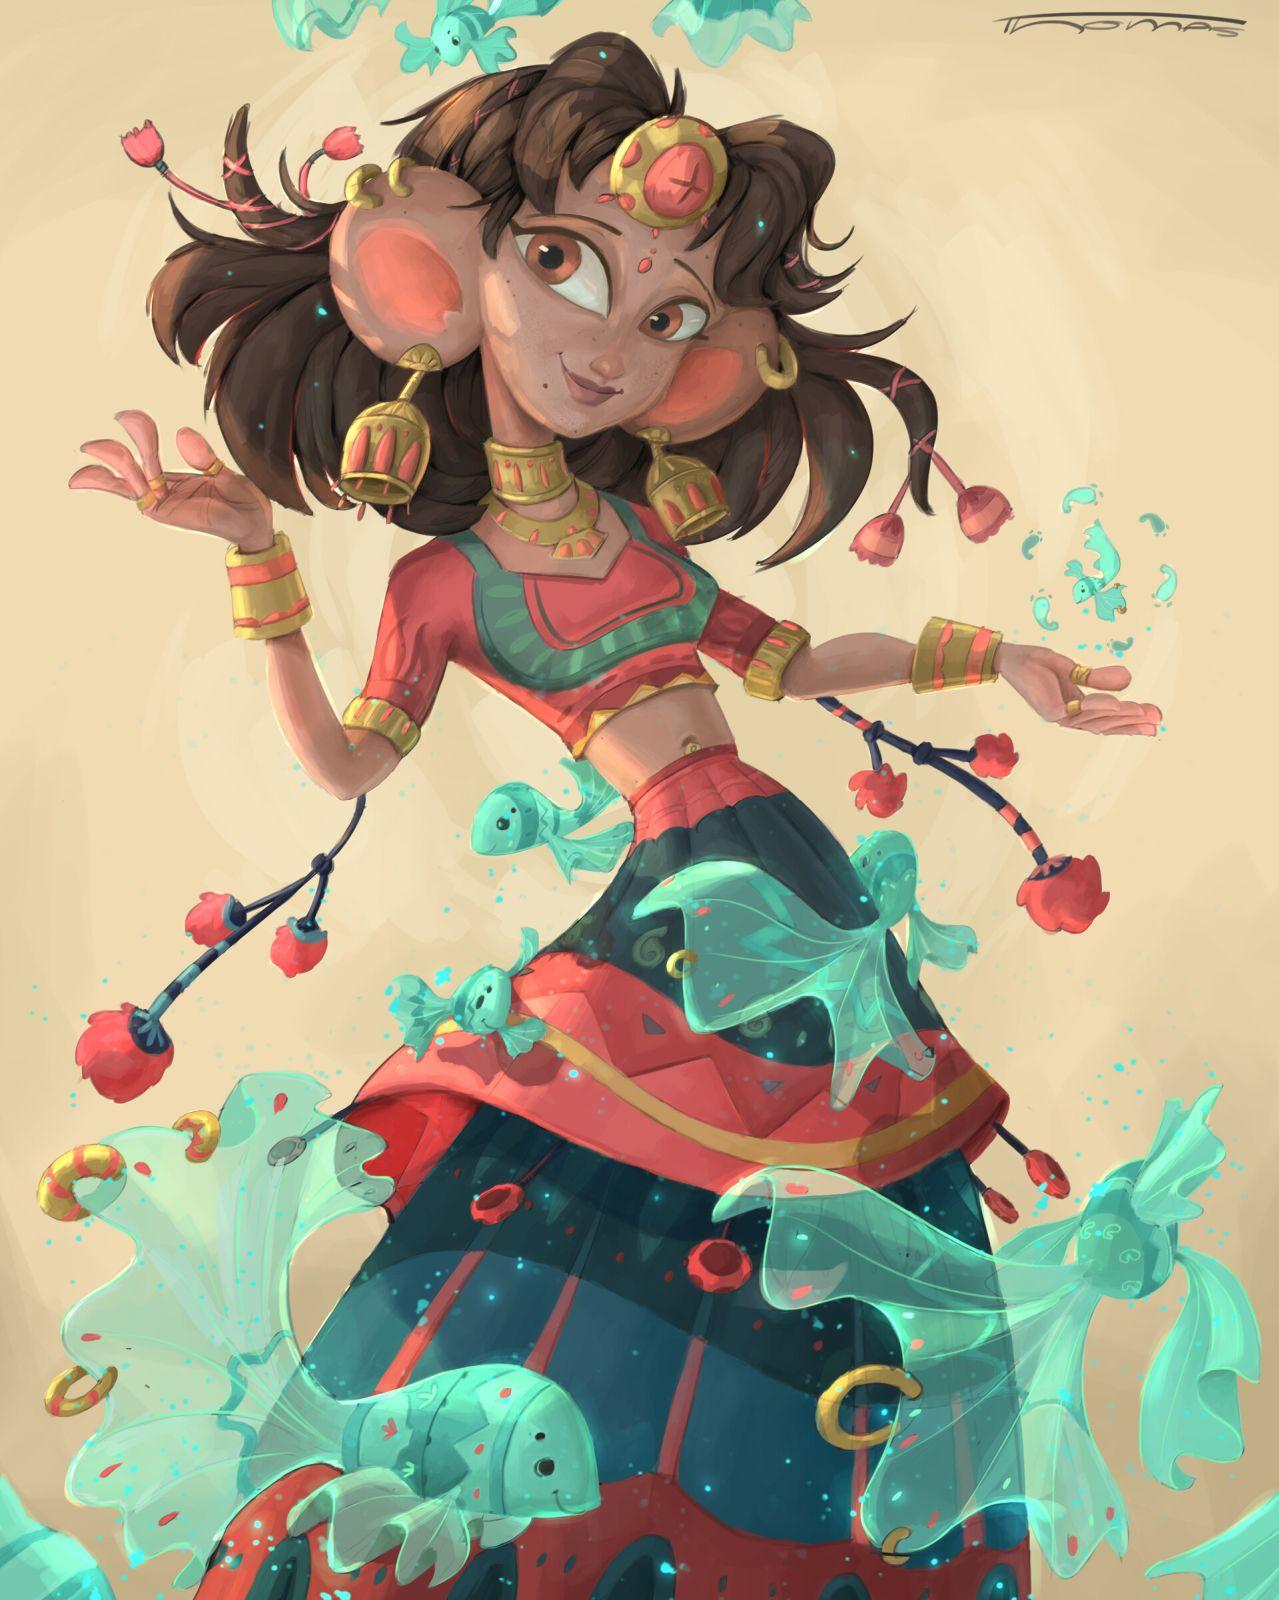 digital illustration rajasthani girl dancing by thomas fernandes